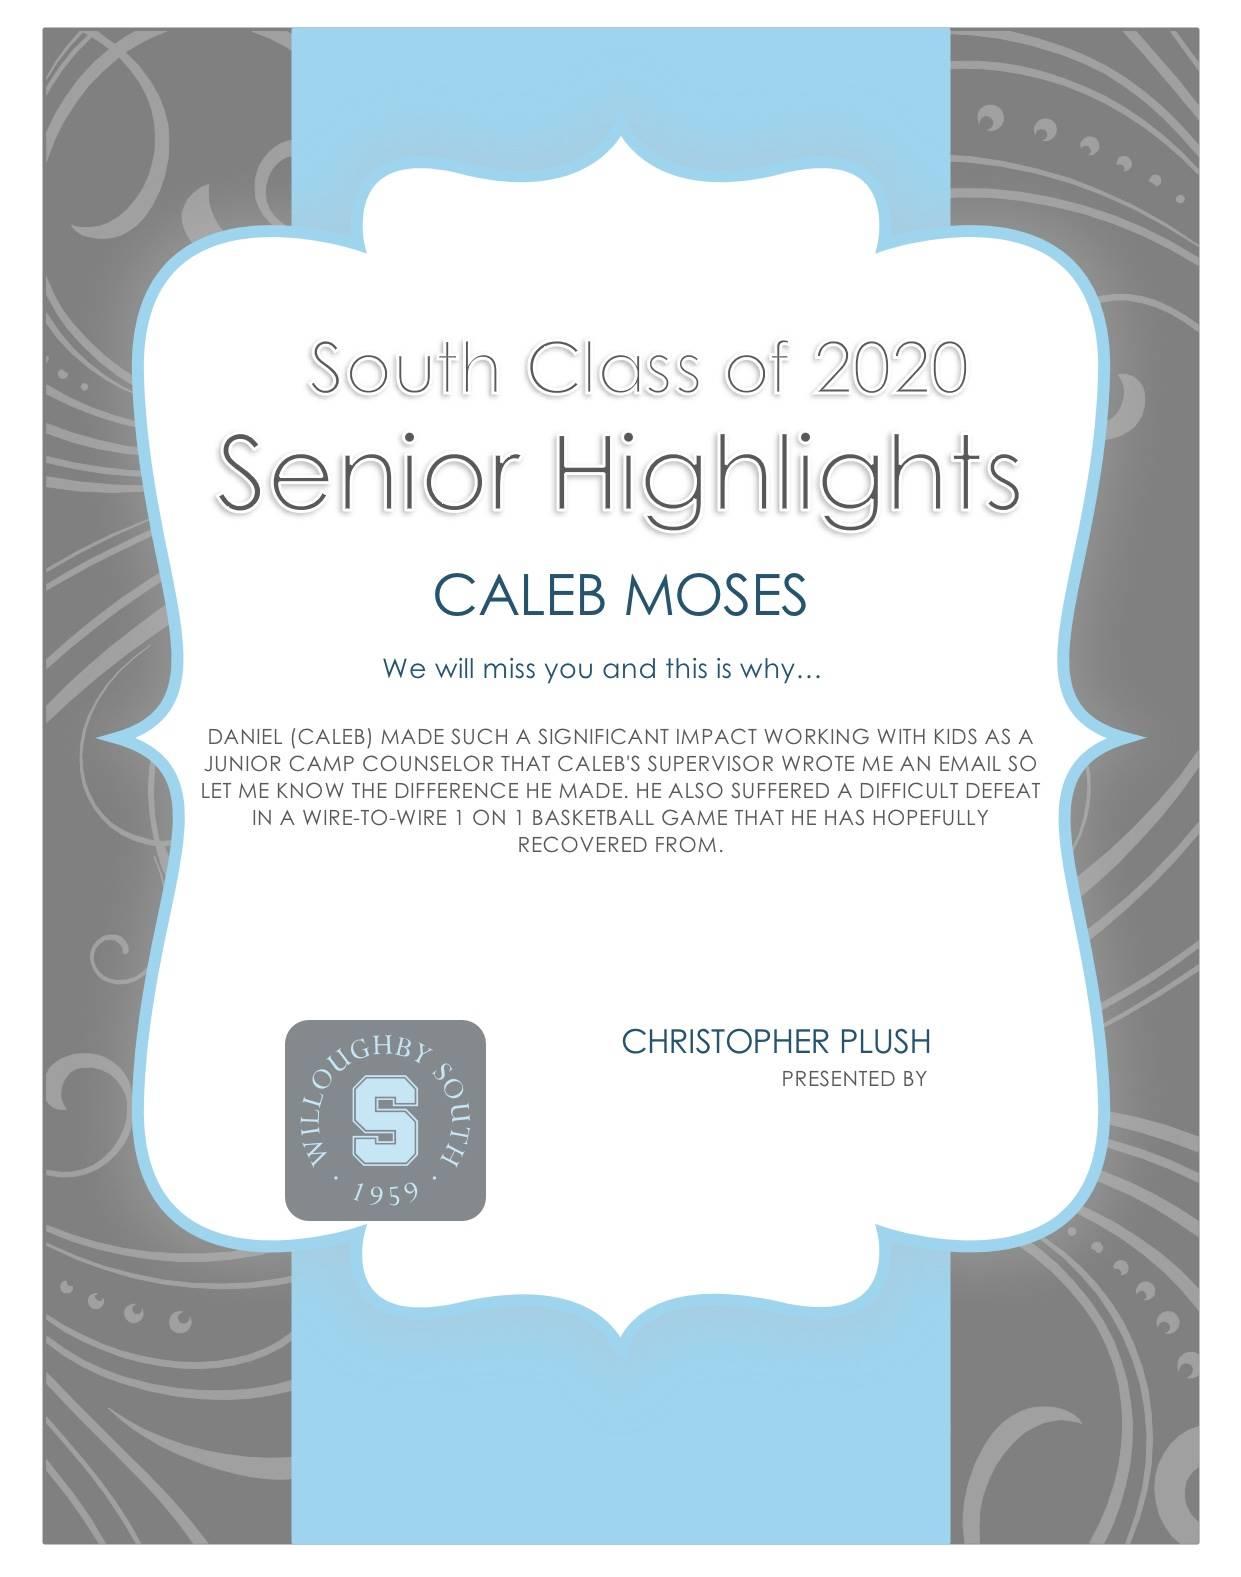 Caleb Moses